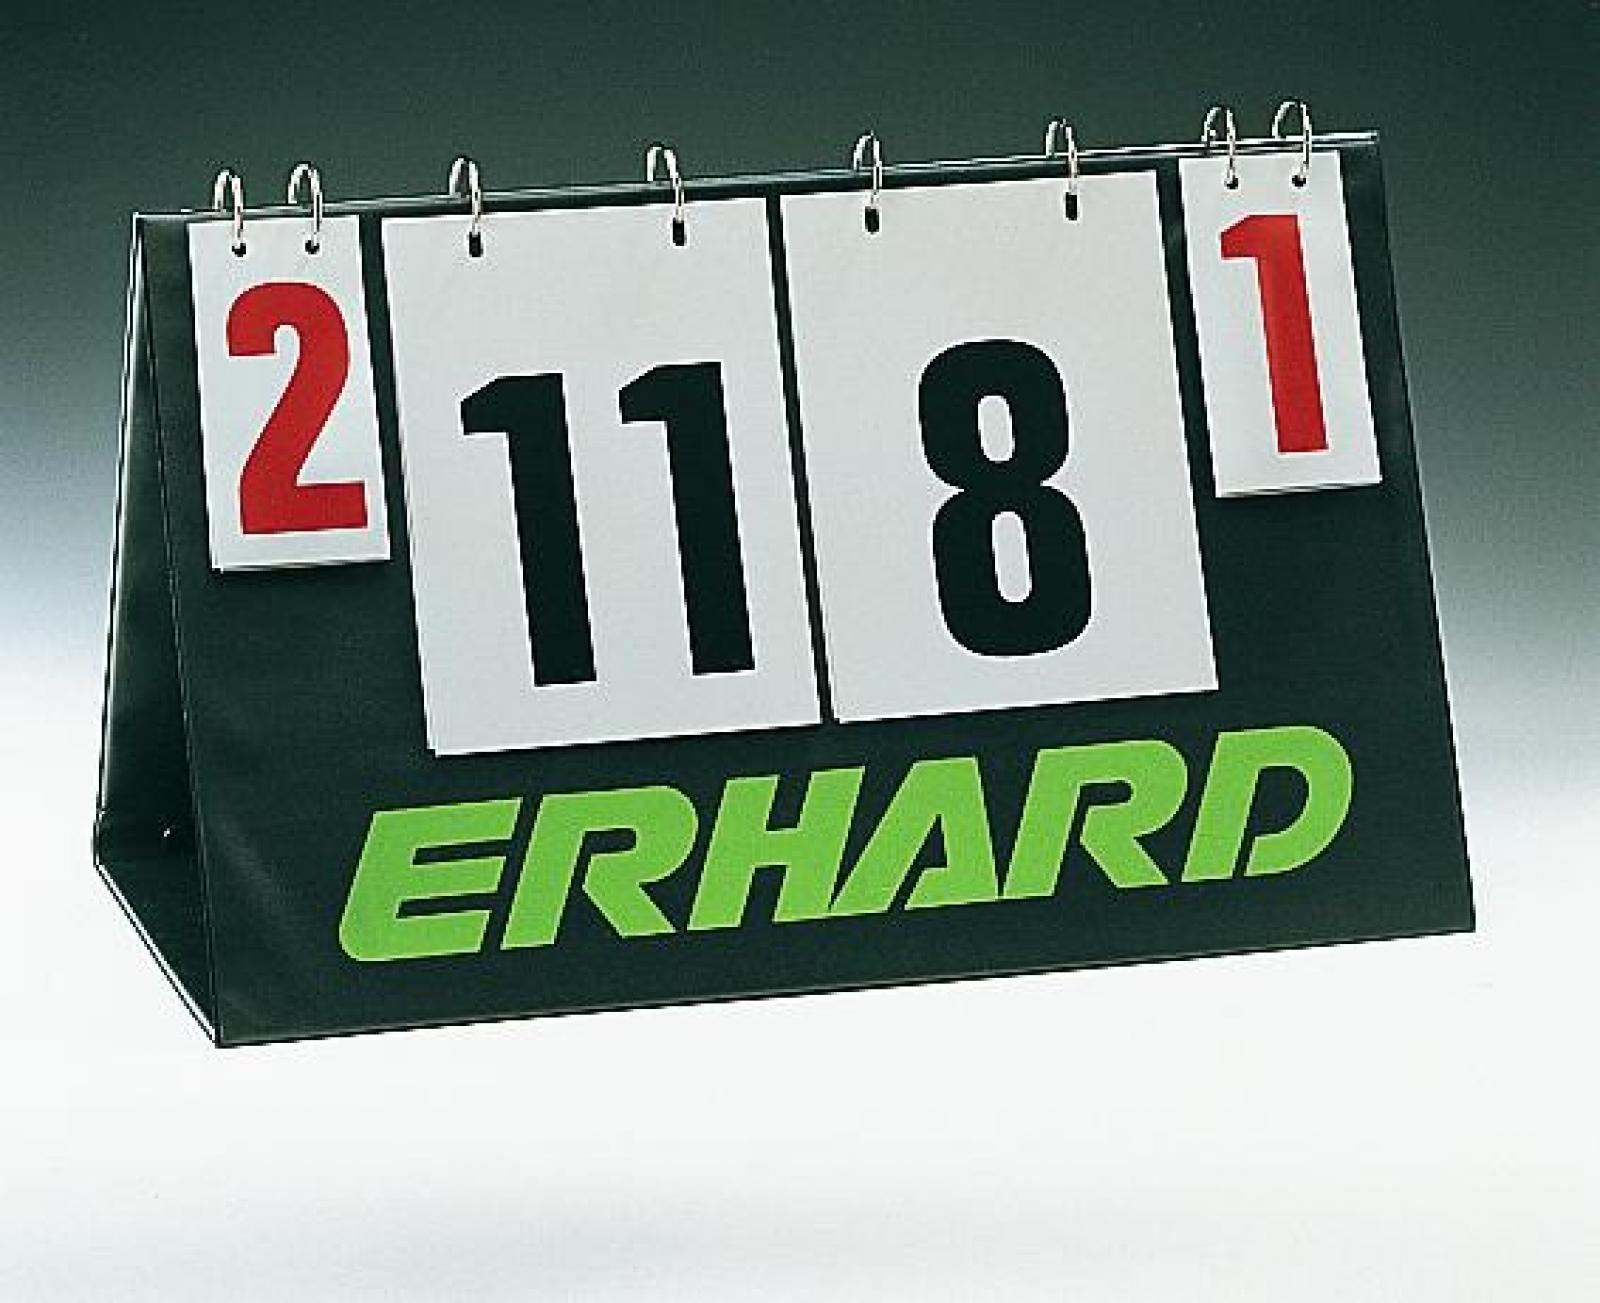 Stolní ukazatel skóre pro volejbal - Erhard ® SPORT Volejbal .